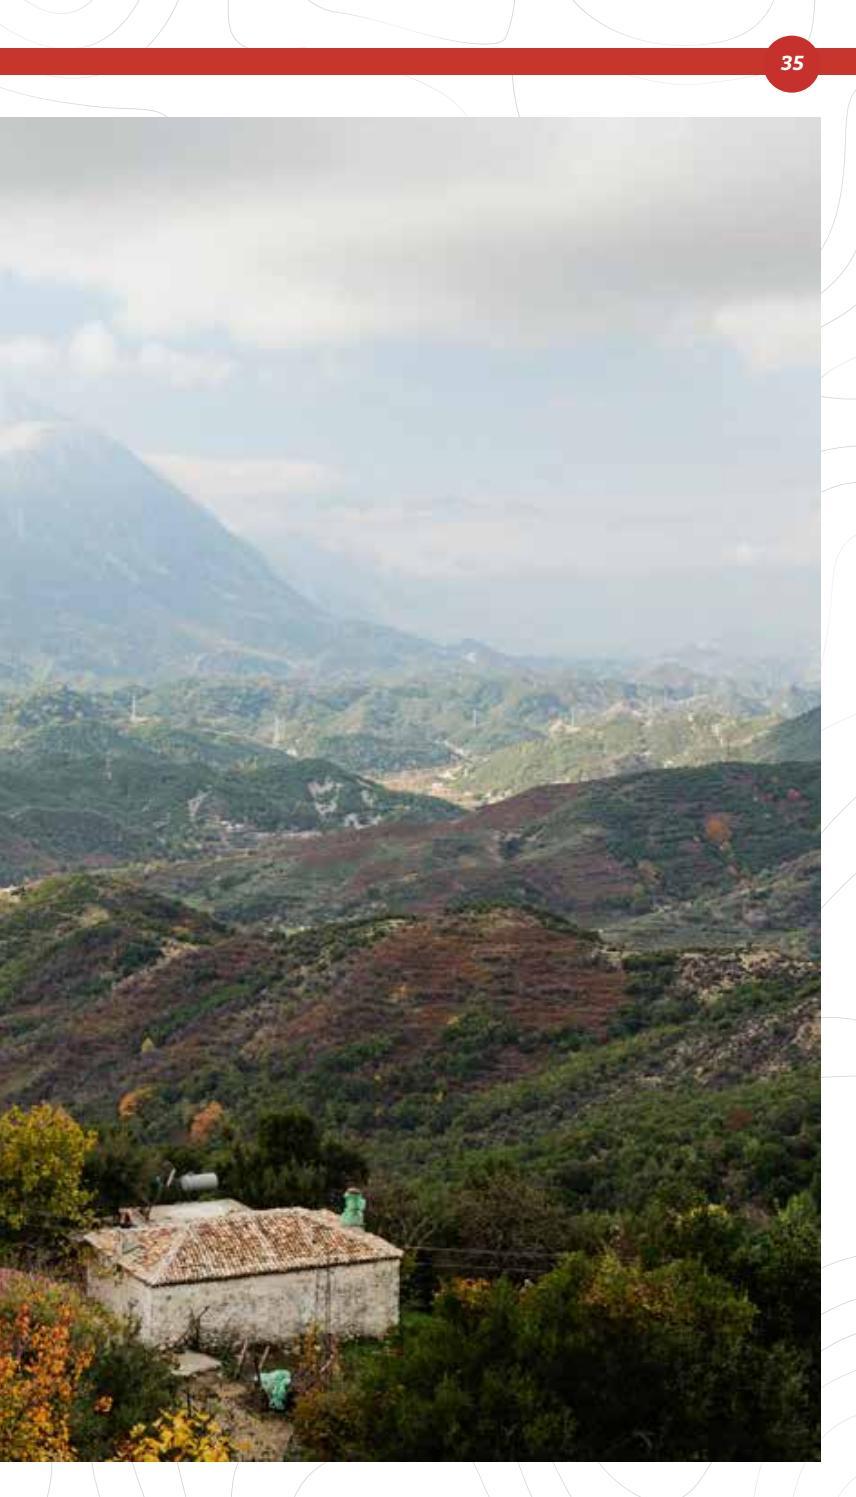 Hiking Trails in Himara Region page 35